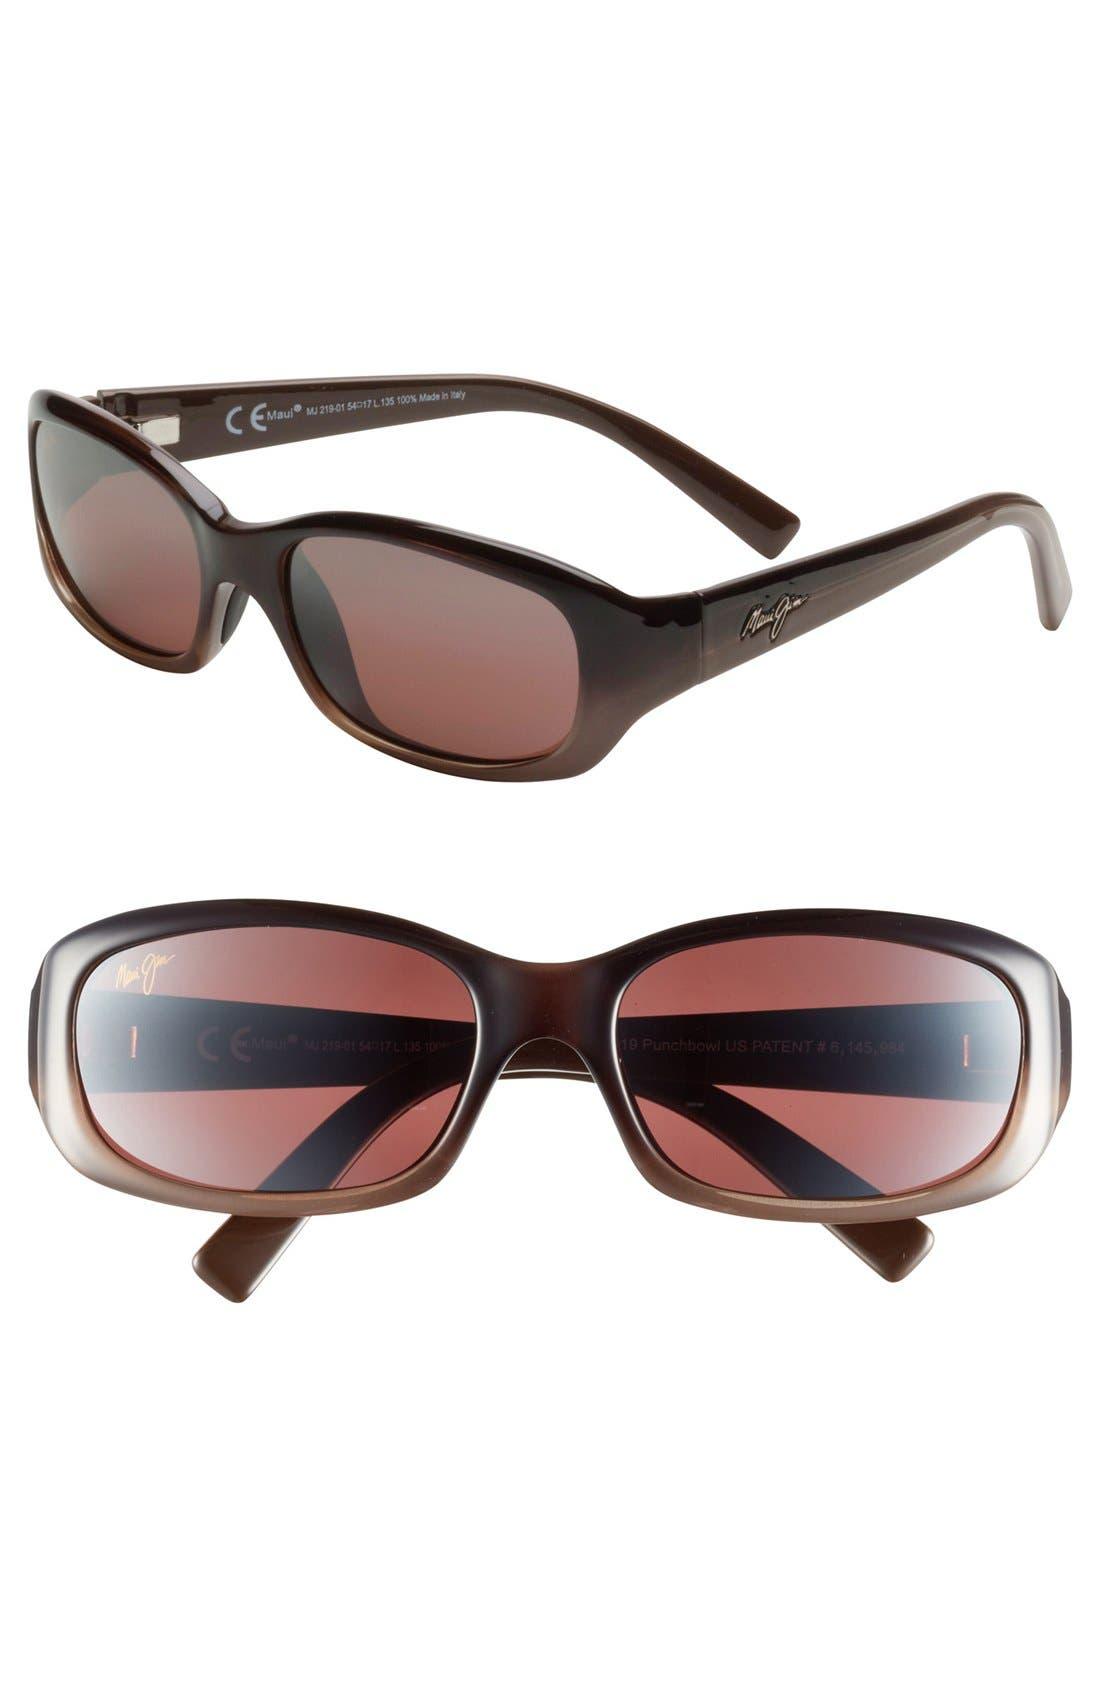 Maui Jim Punchbowl 5m Polarizedplus Sunglasses -